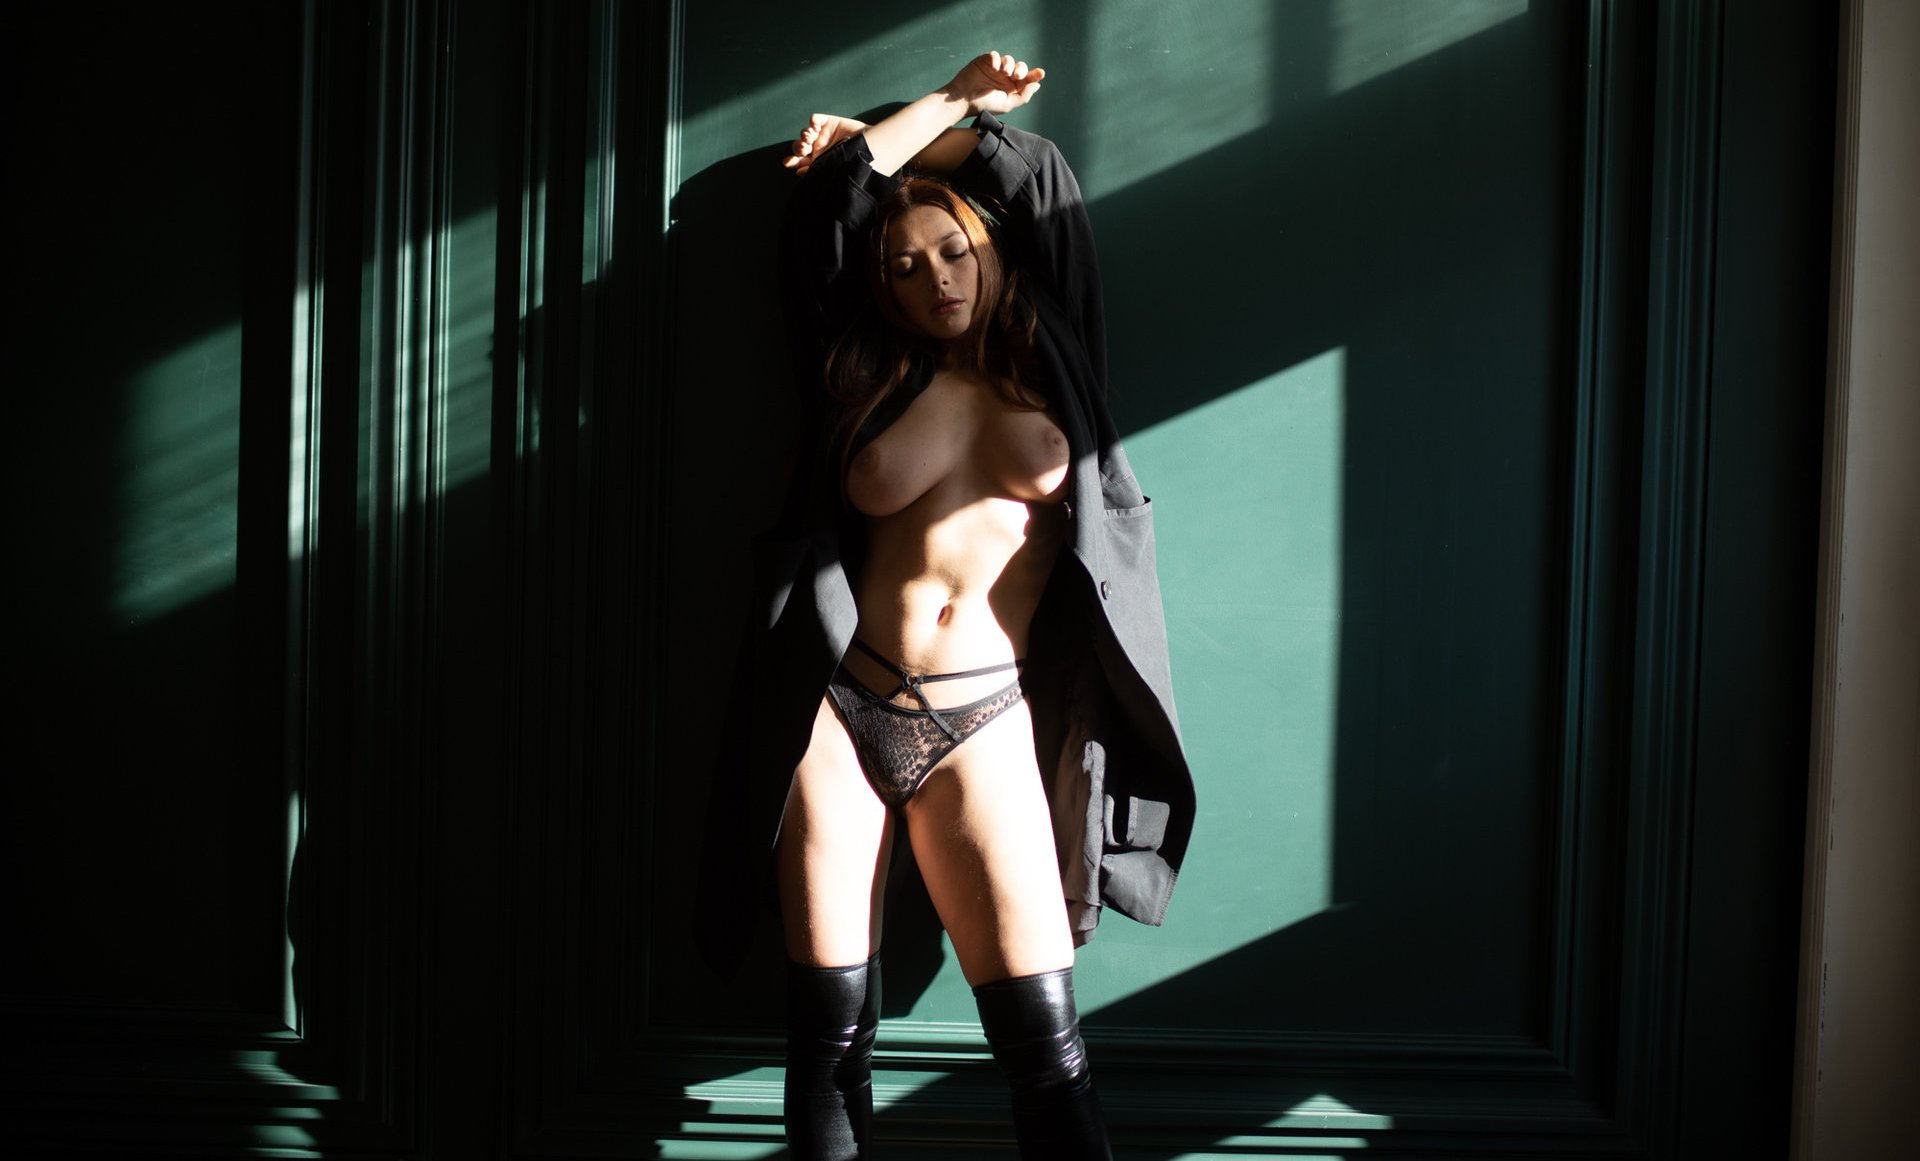 Olga Kobzar Bugs Bunny Gf Nudes Leaks 0023